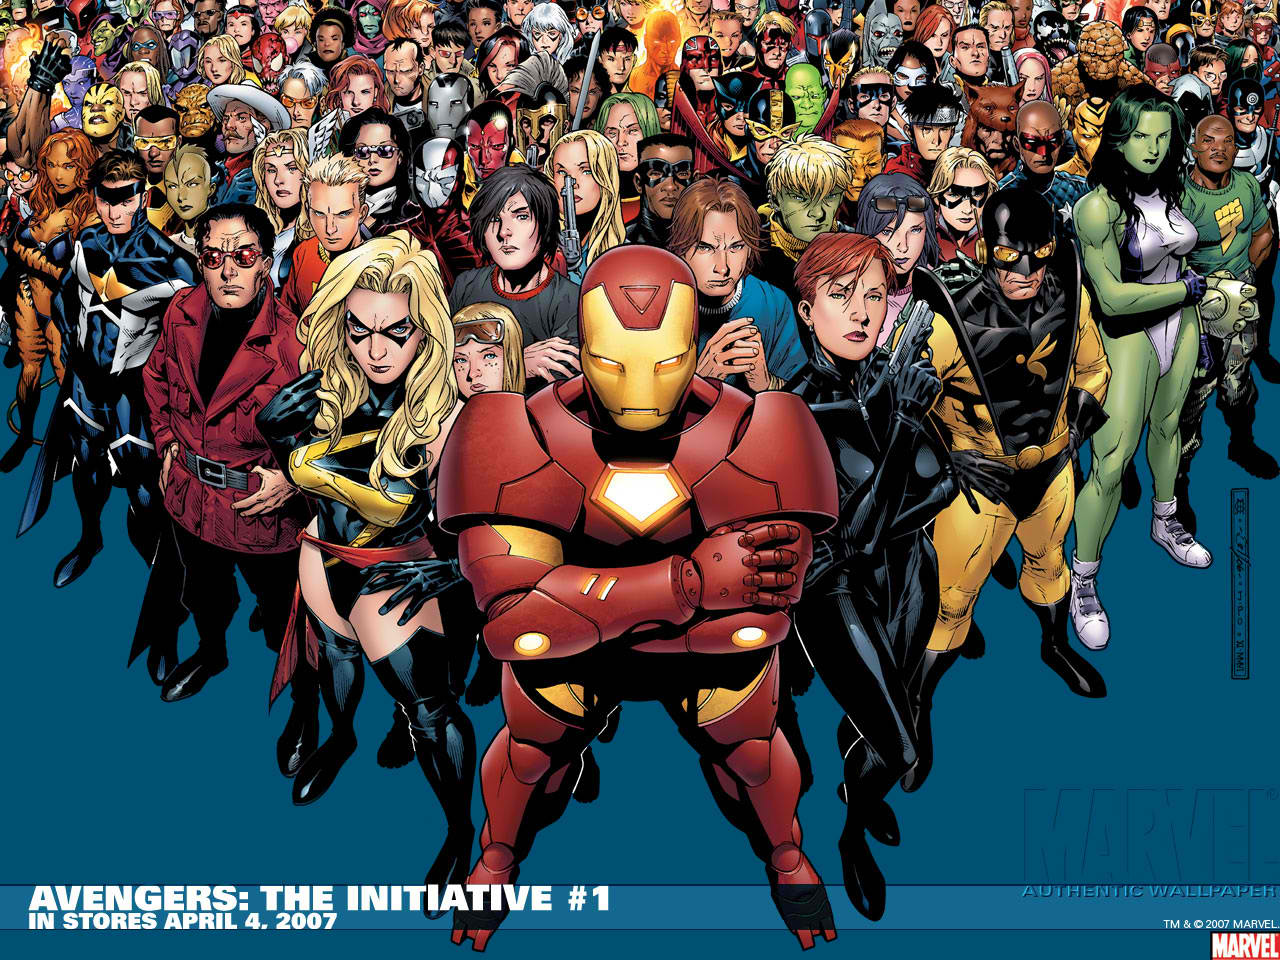 Avengers the initiative co recommended comics wiki - Avengers superhero wallpaper ...